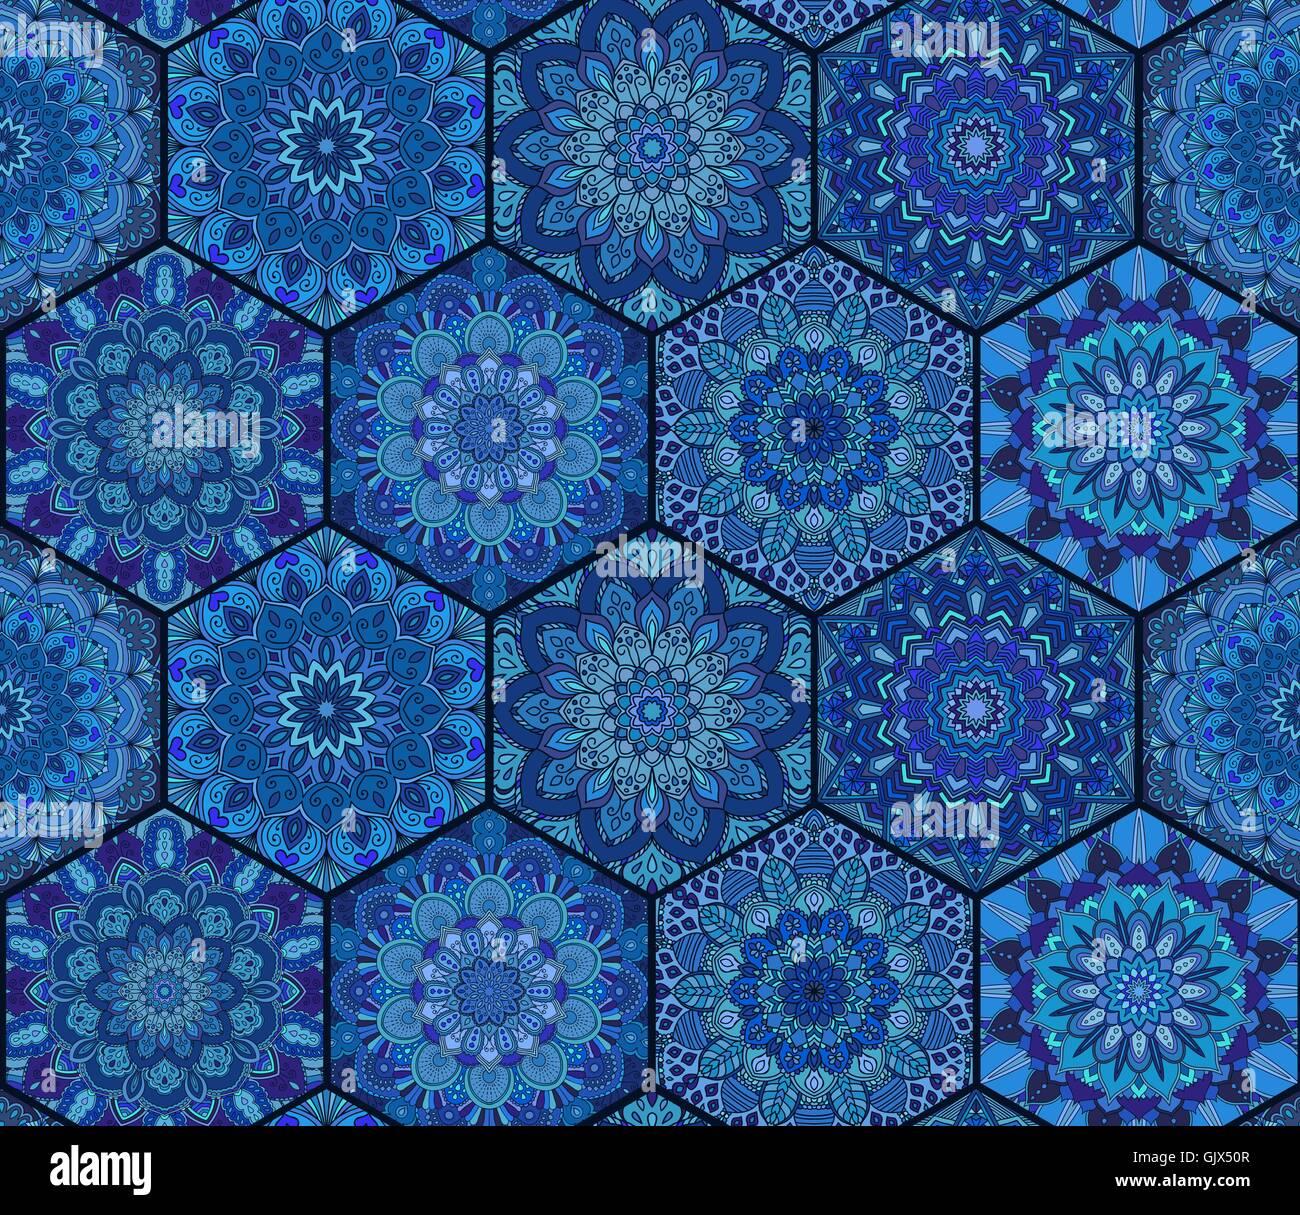 Fliesen Blau Sechseck Mandala Vektor Abbildung Bild 114900711 Alamy